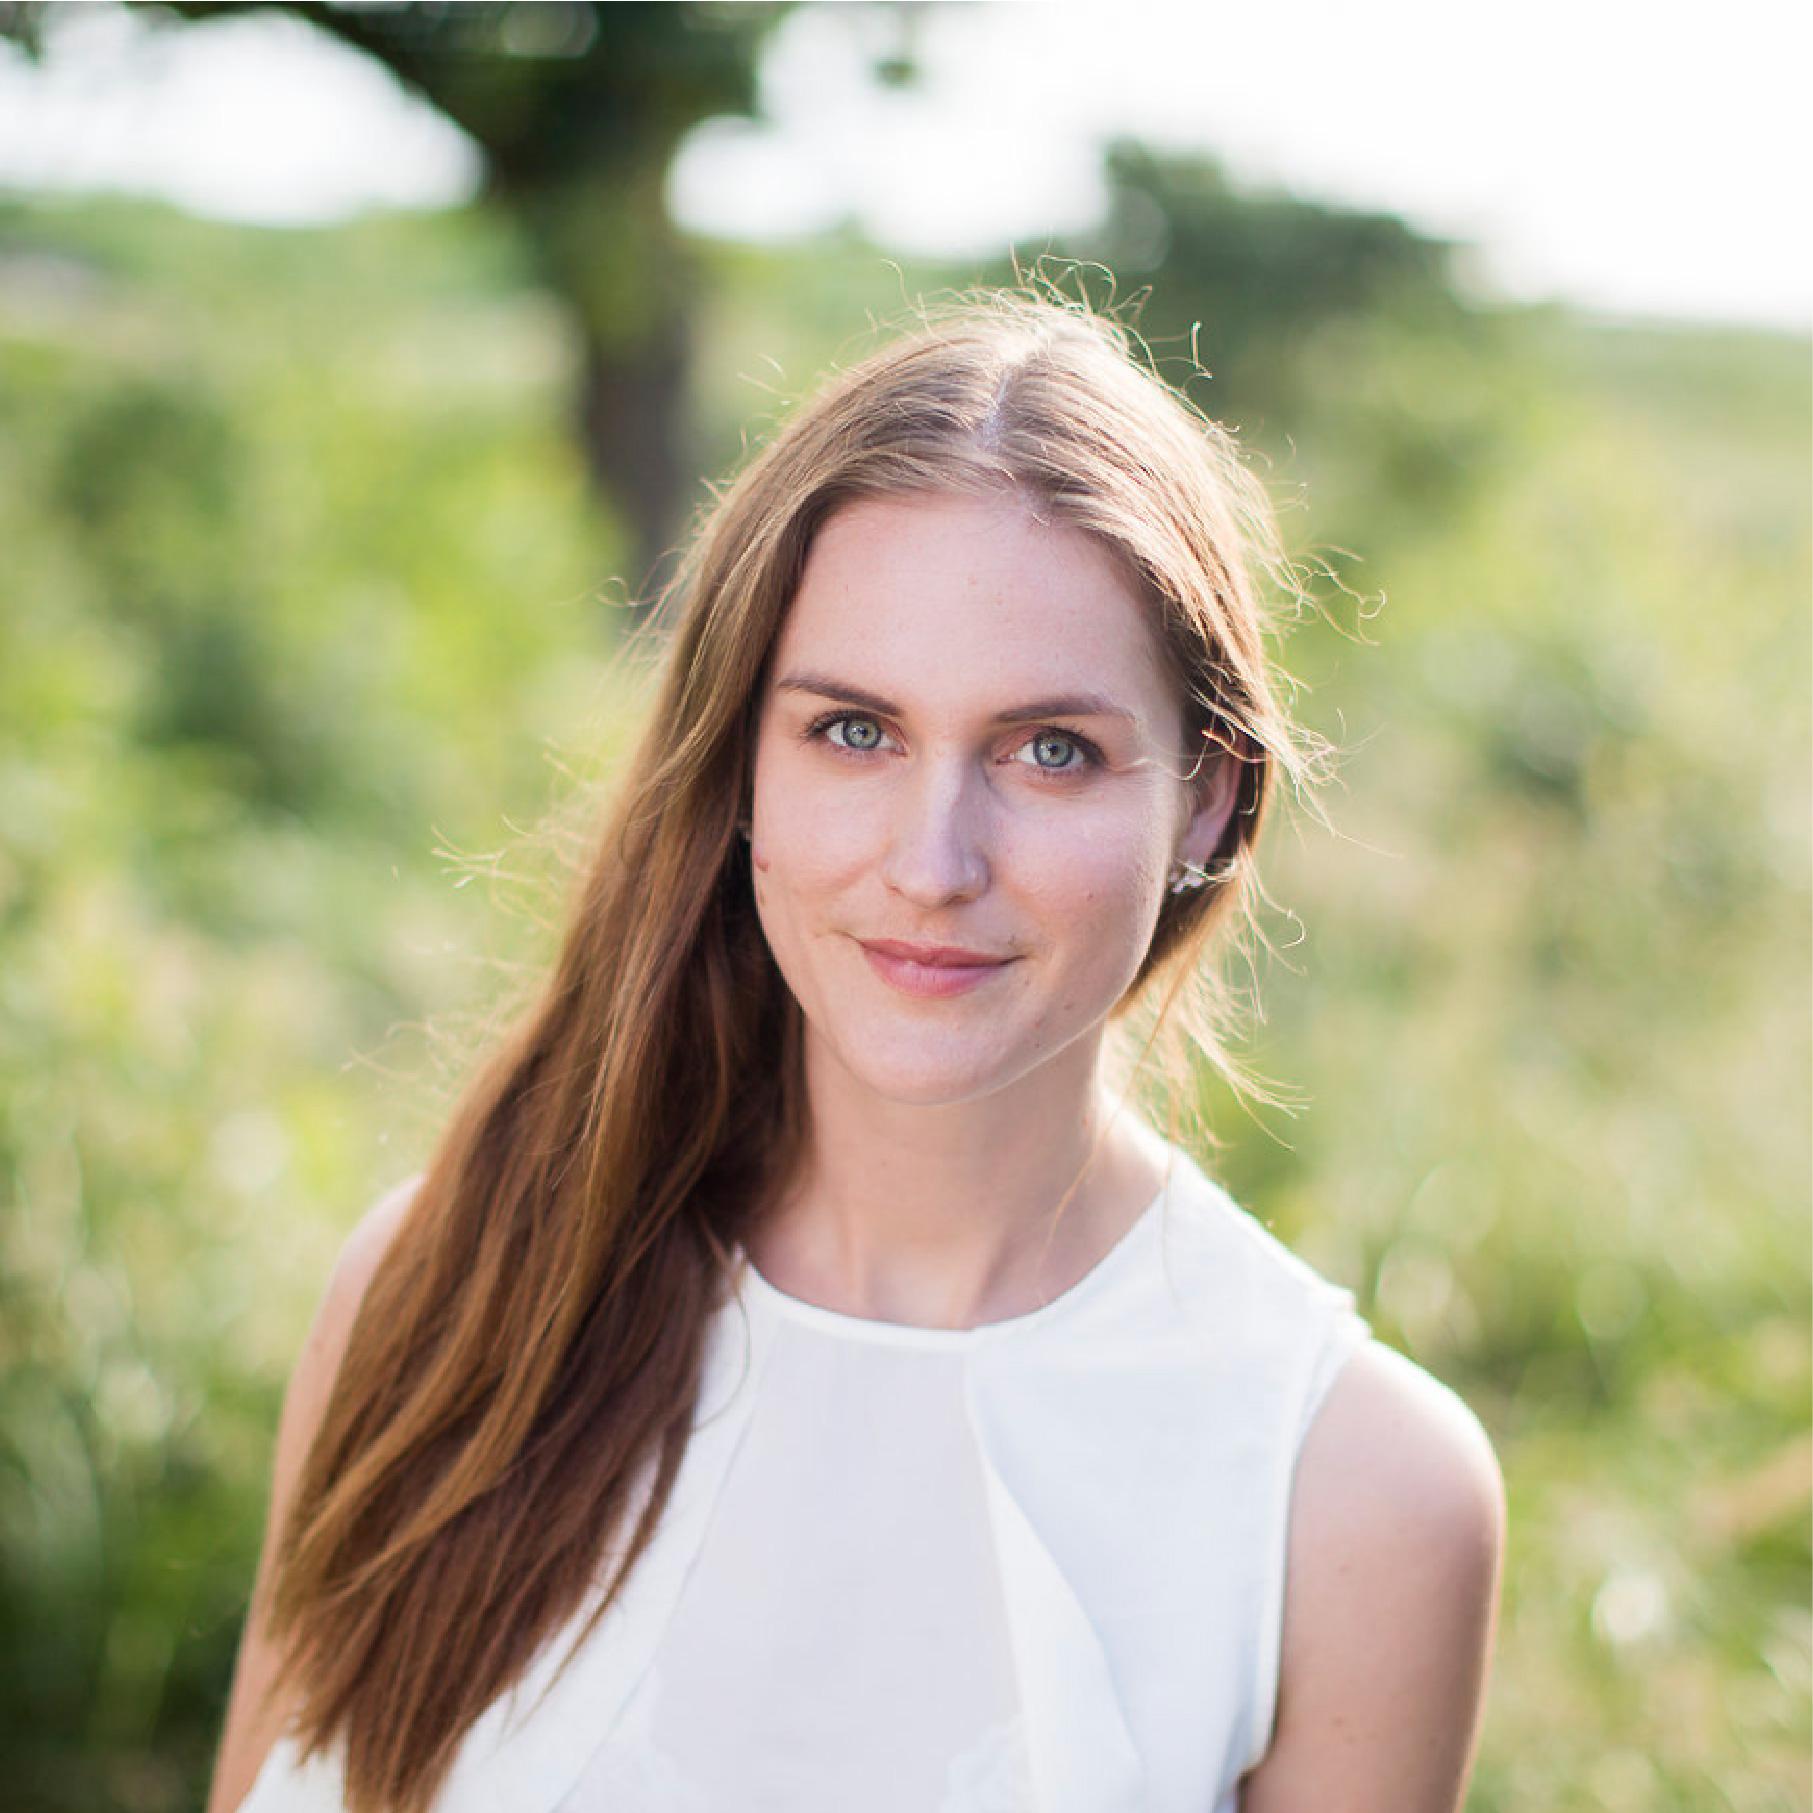 Elinor Samuelsson